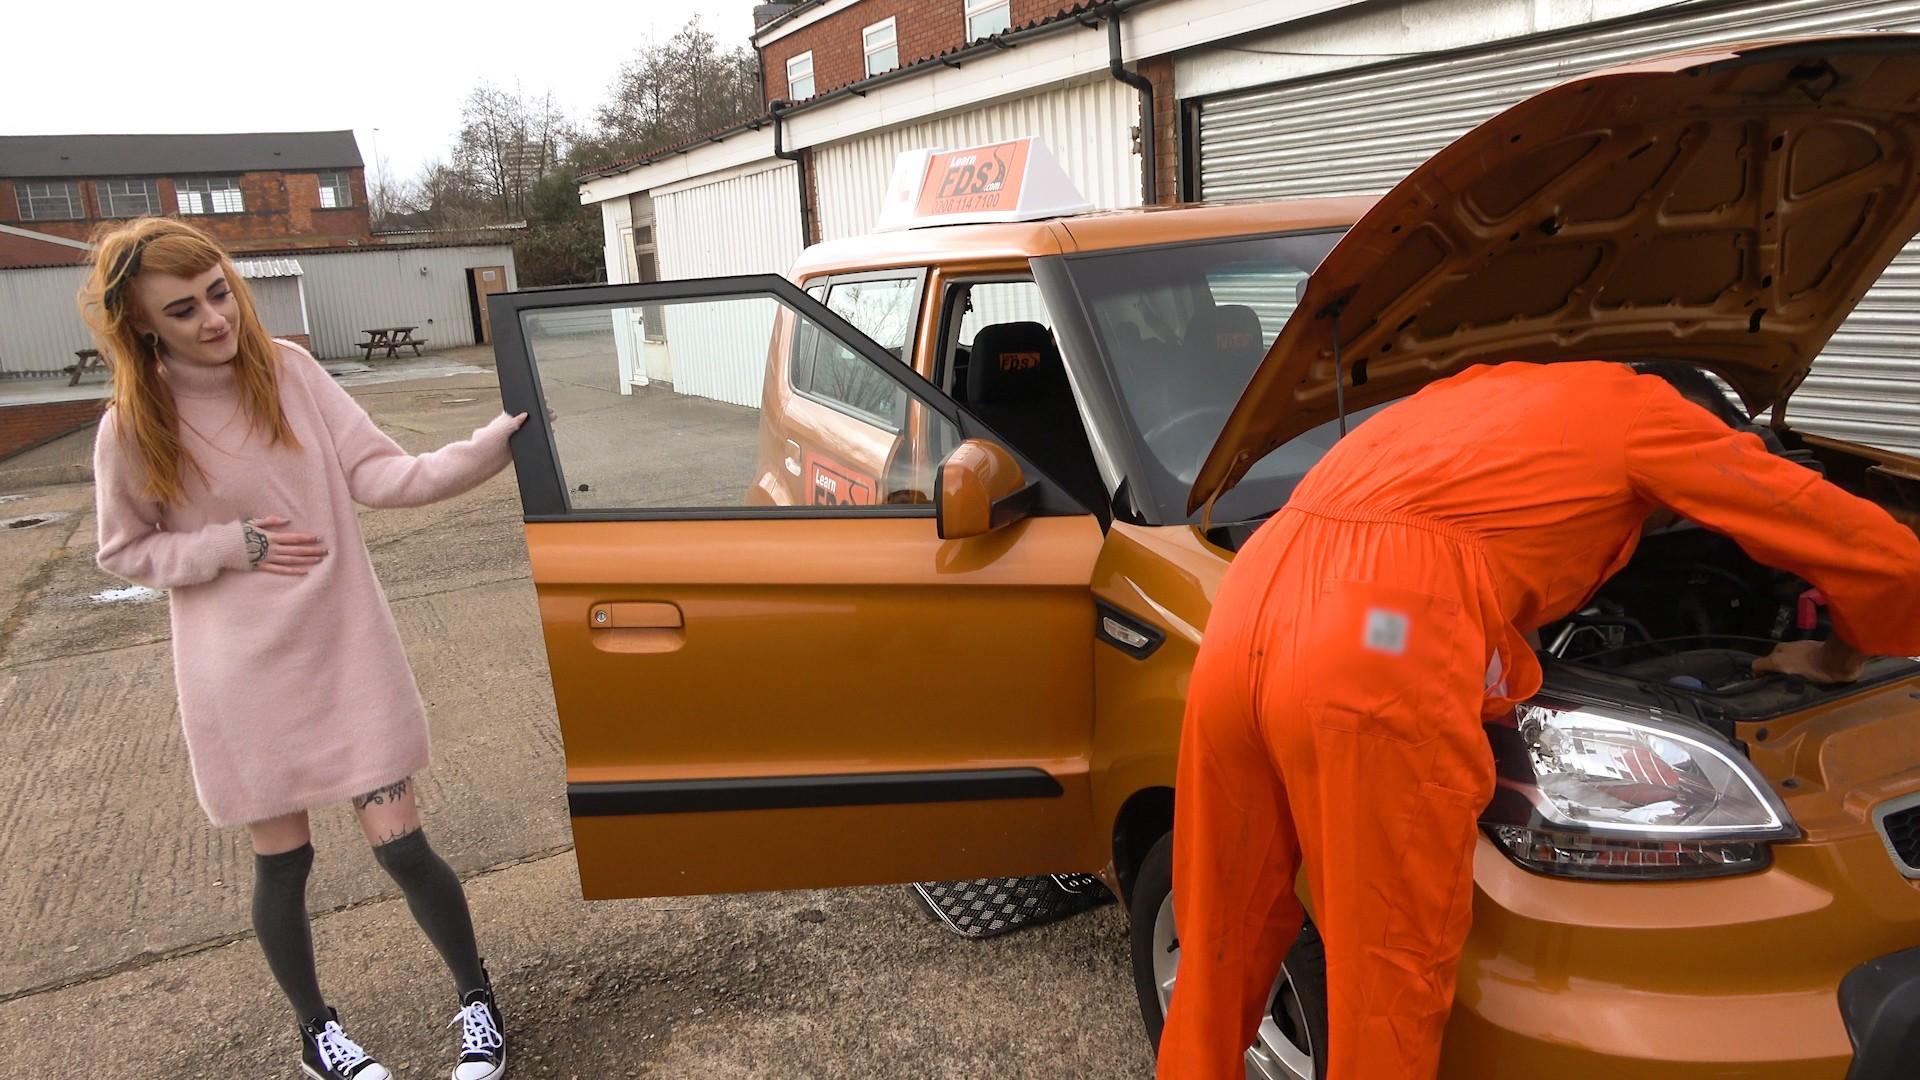 Minx squirts on mechanics big cock - Fake Driving School